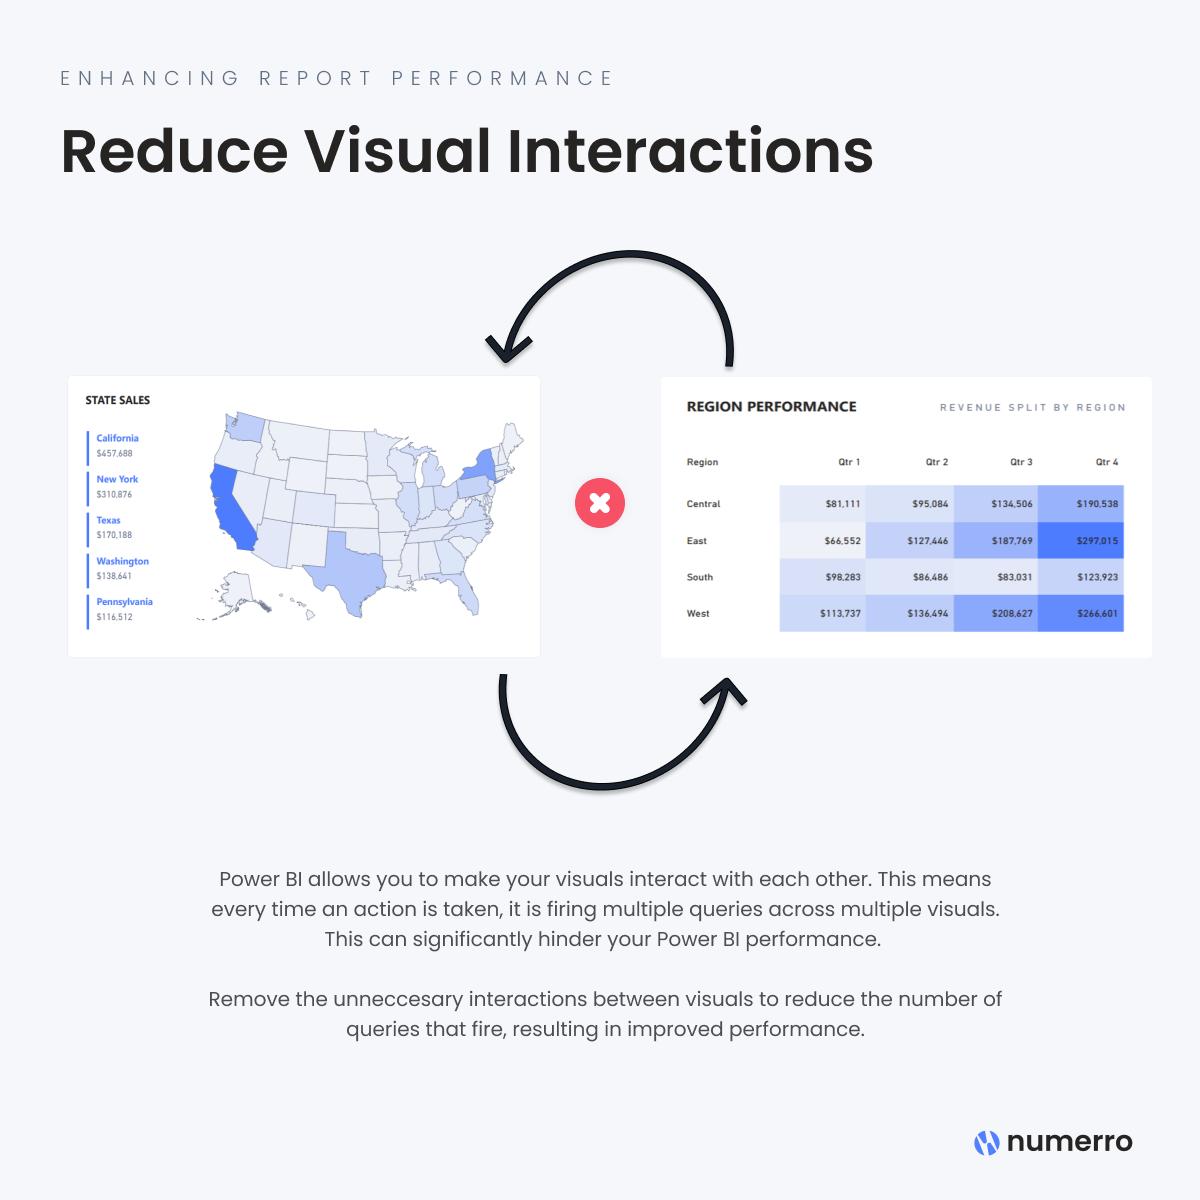 Enhancing Report Performance - Reduce Visual Interactions